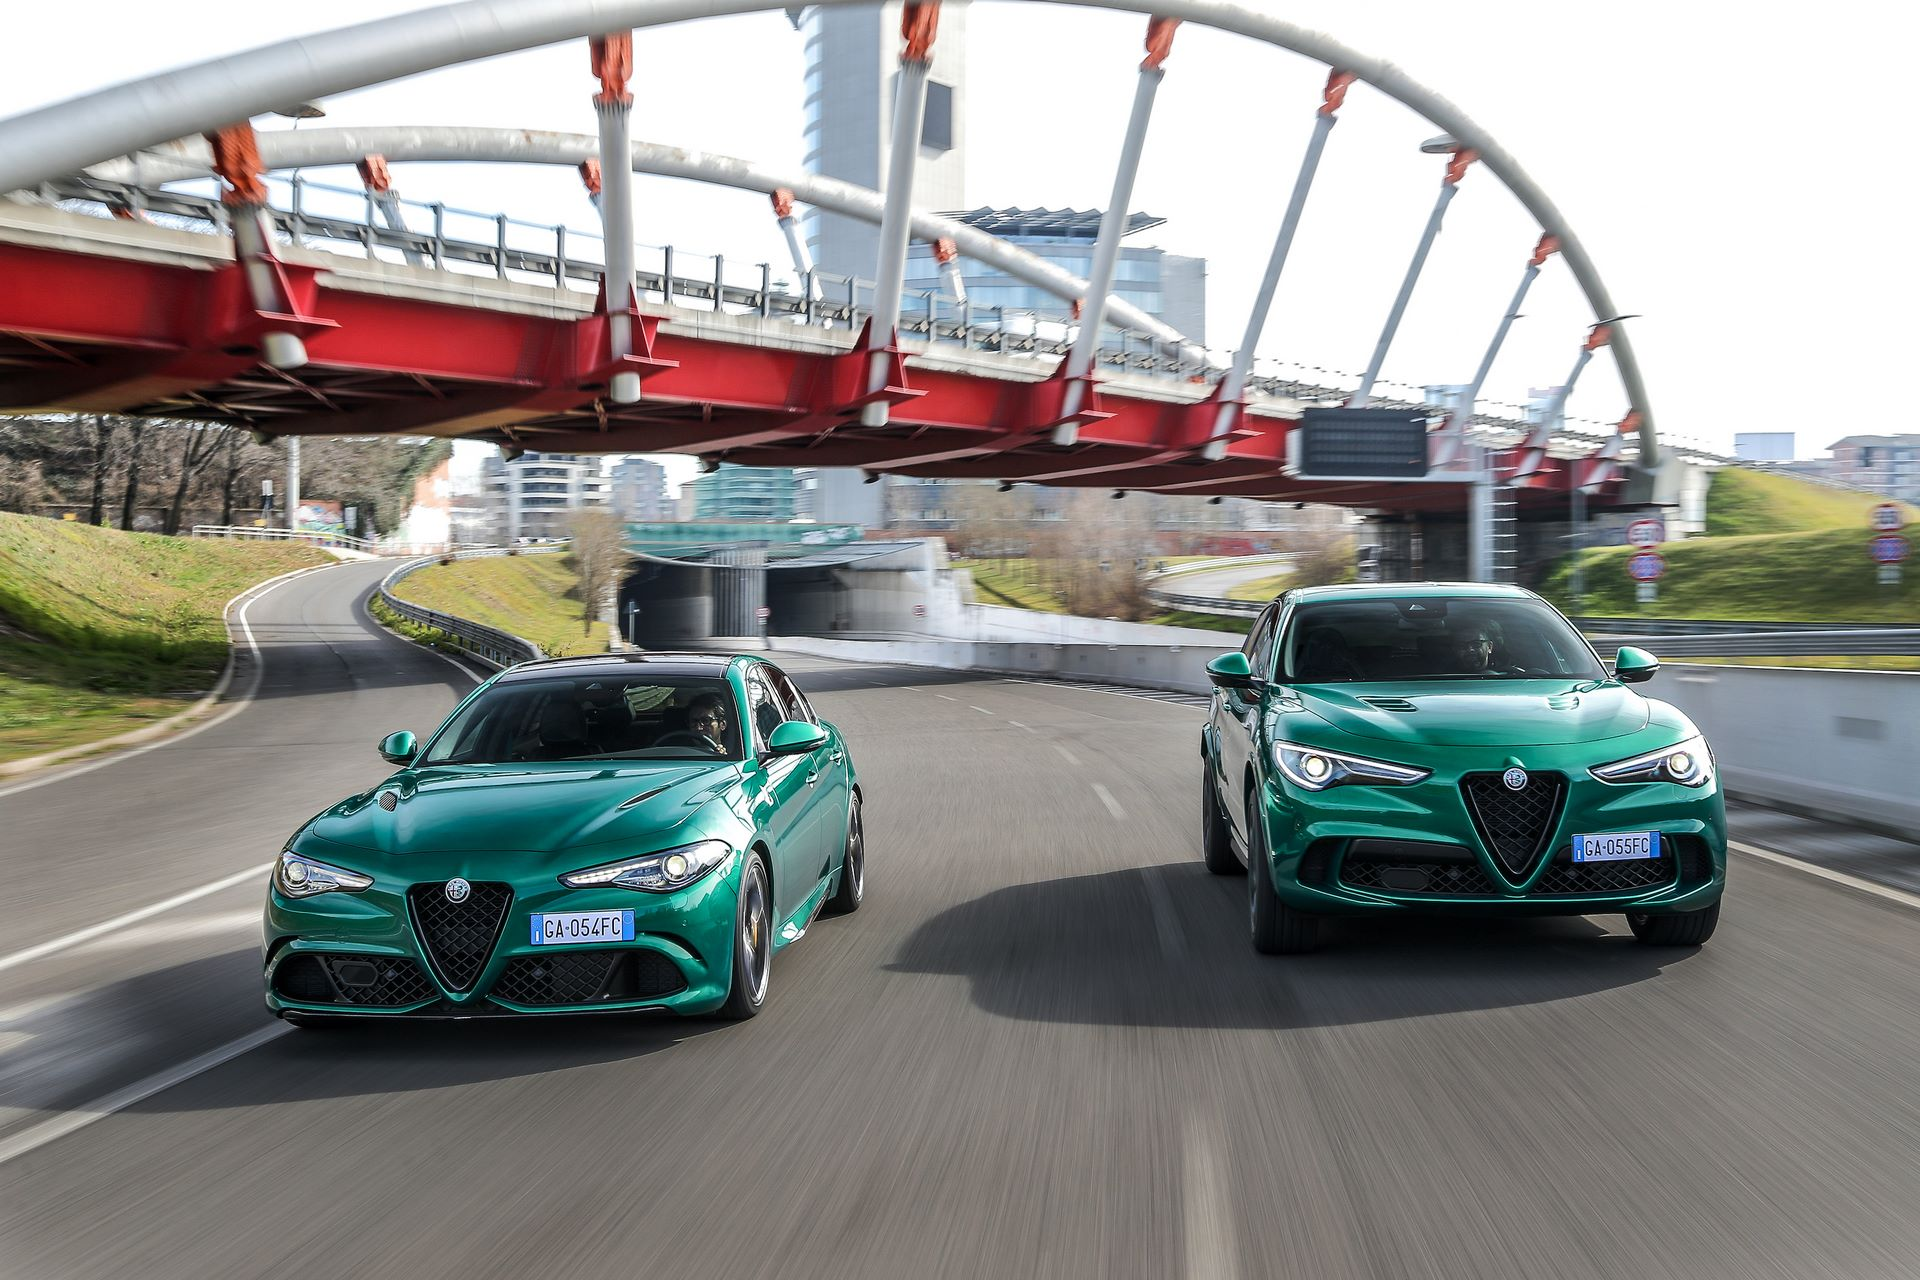 Alfa-Romeo-Giulia-Quadrifoglio-Stelvio-Quadrifoglio-facelift-2020-25